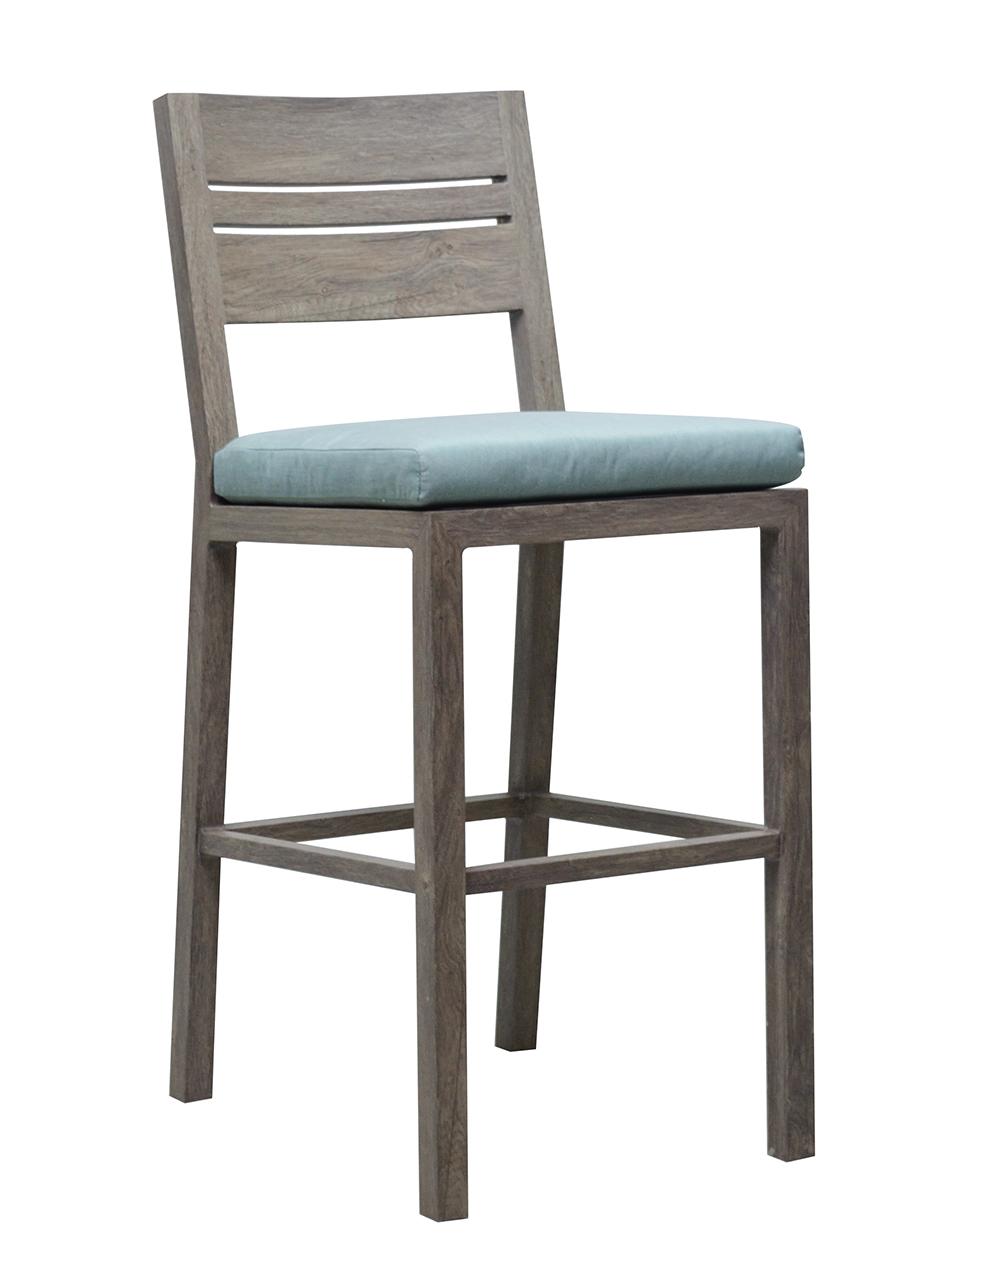 "975408 Aspen Armless Bar Chair      18.6"" x 23.4"" x 45"""